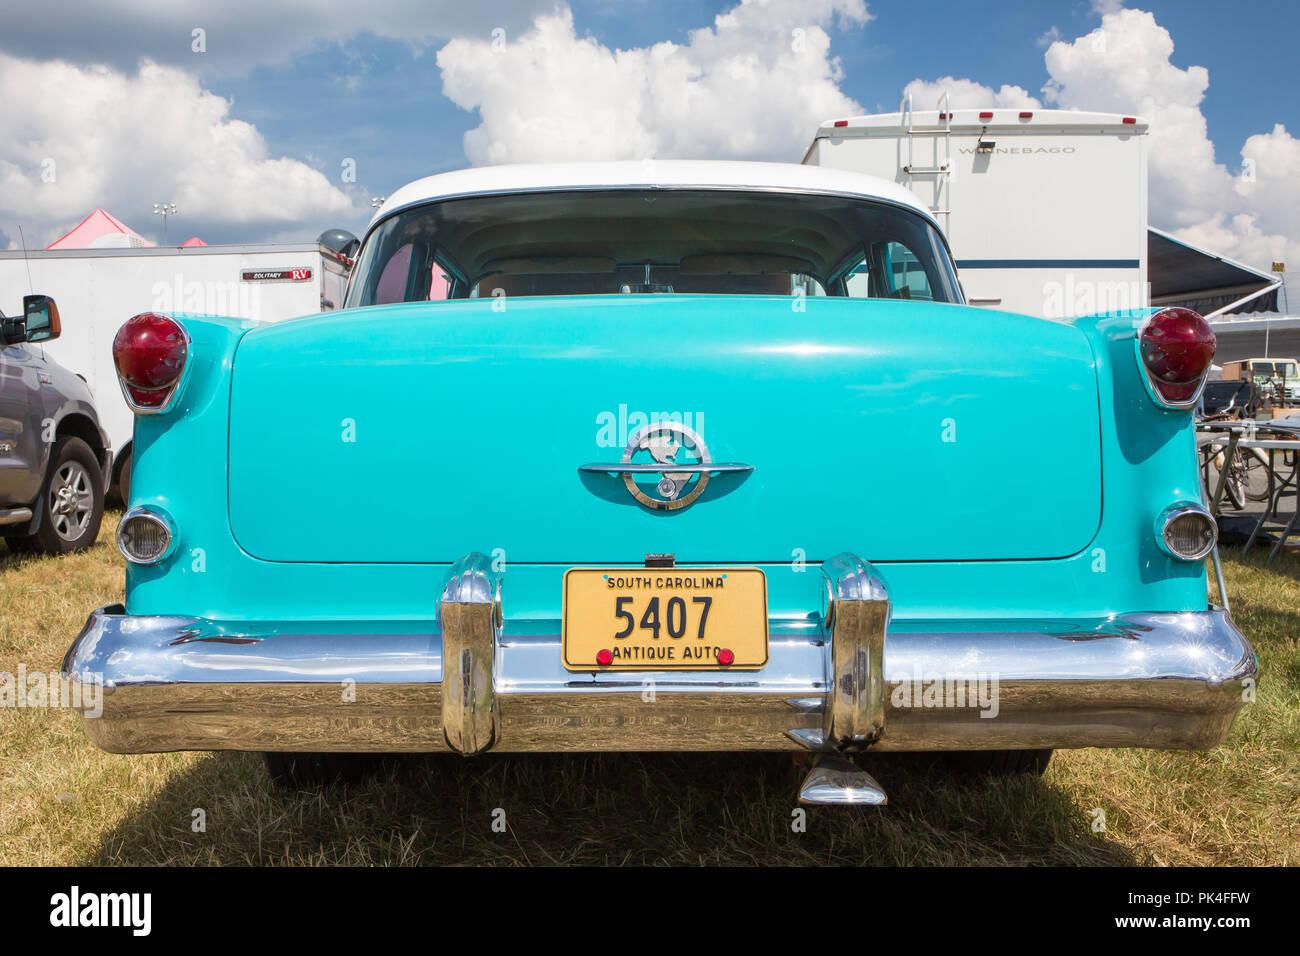 CONCORD, NC (USA) - September 7, 2018: A 1954 Oldsmobile